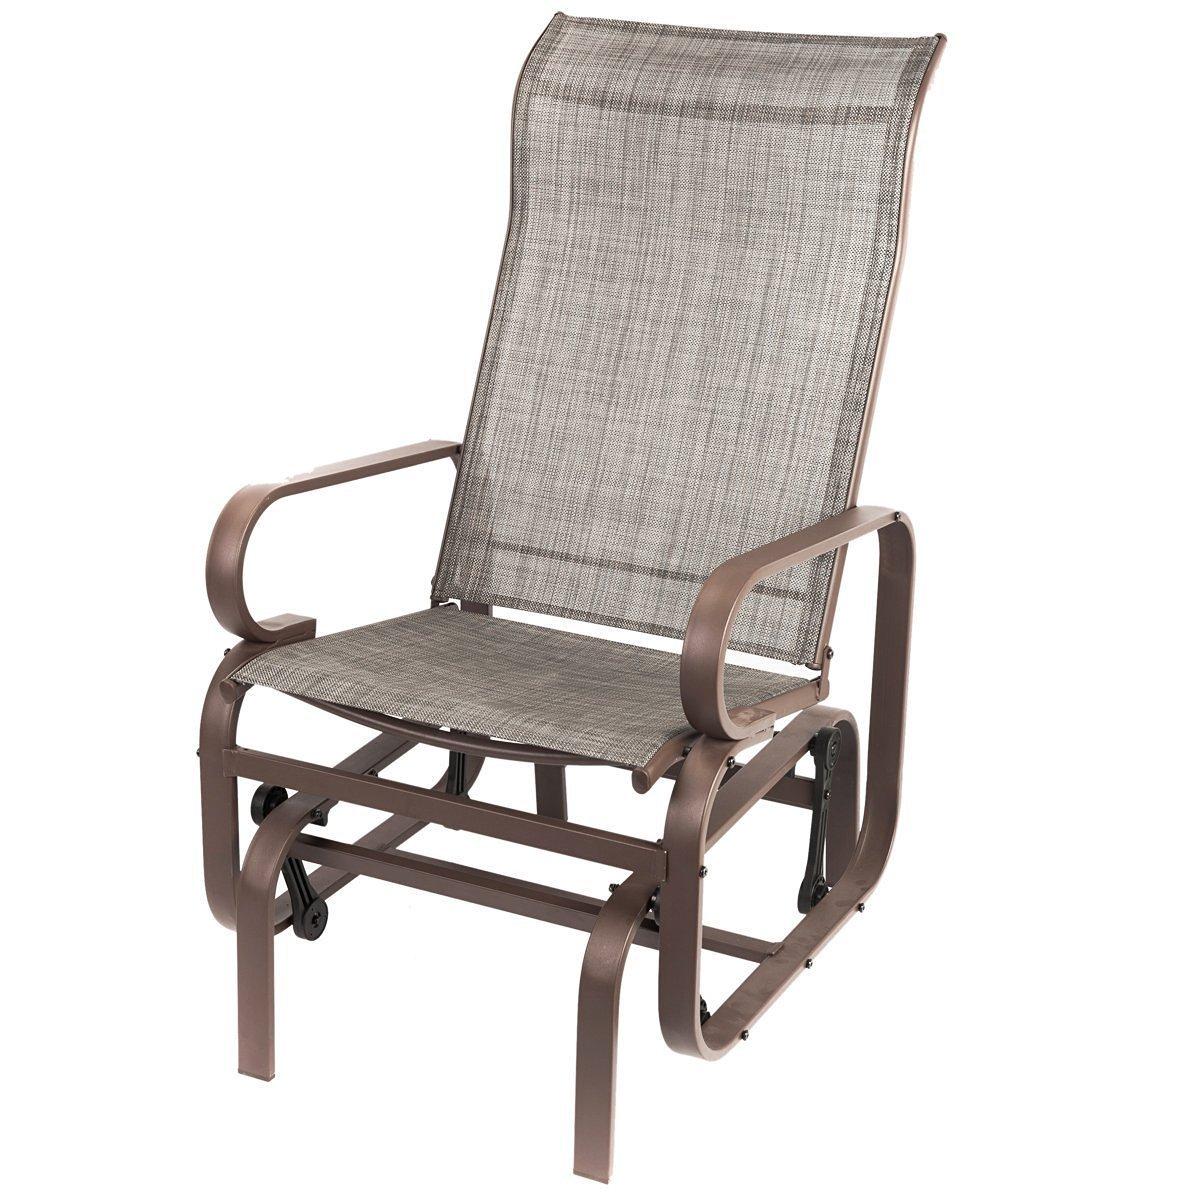 outdoor gliders naturefun outdoor patio rocker chair, balcony glider rocking lounge chair,  all GIYNWDR